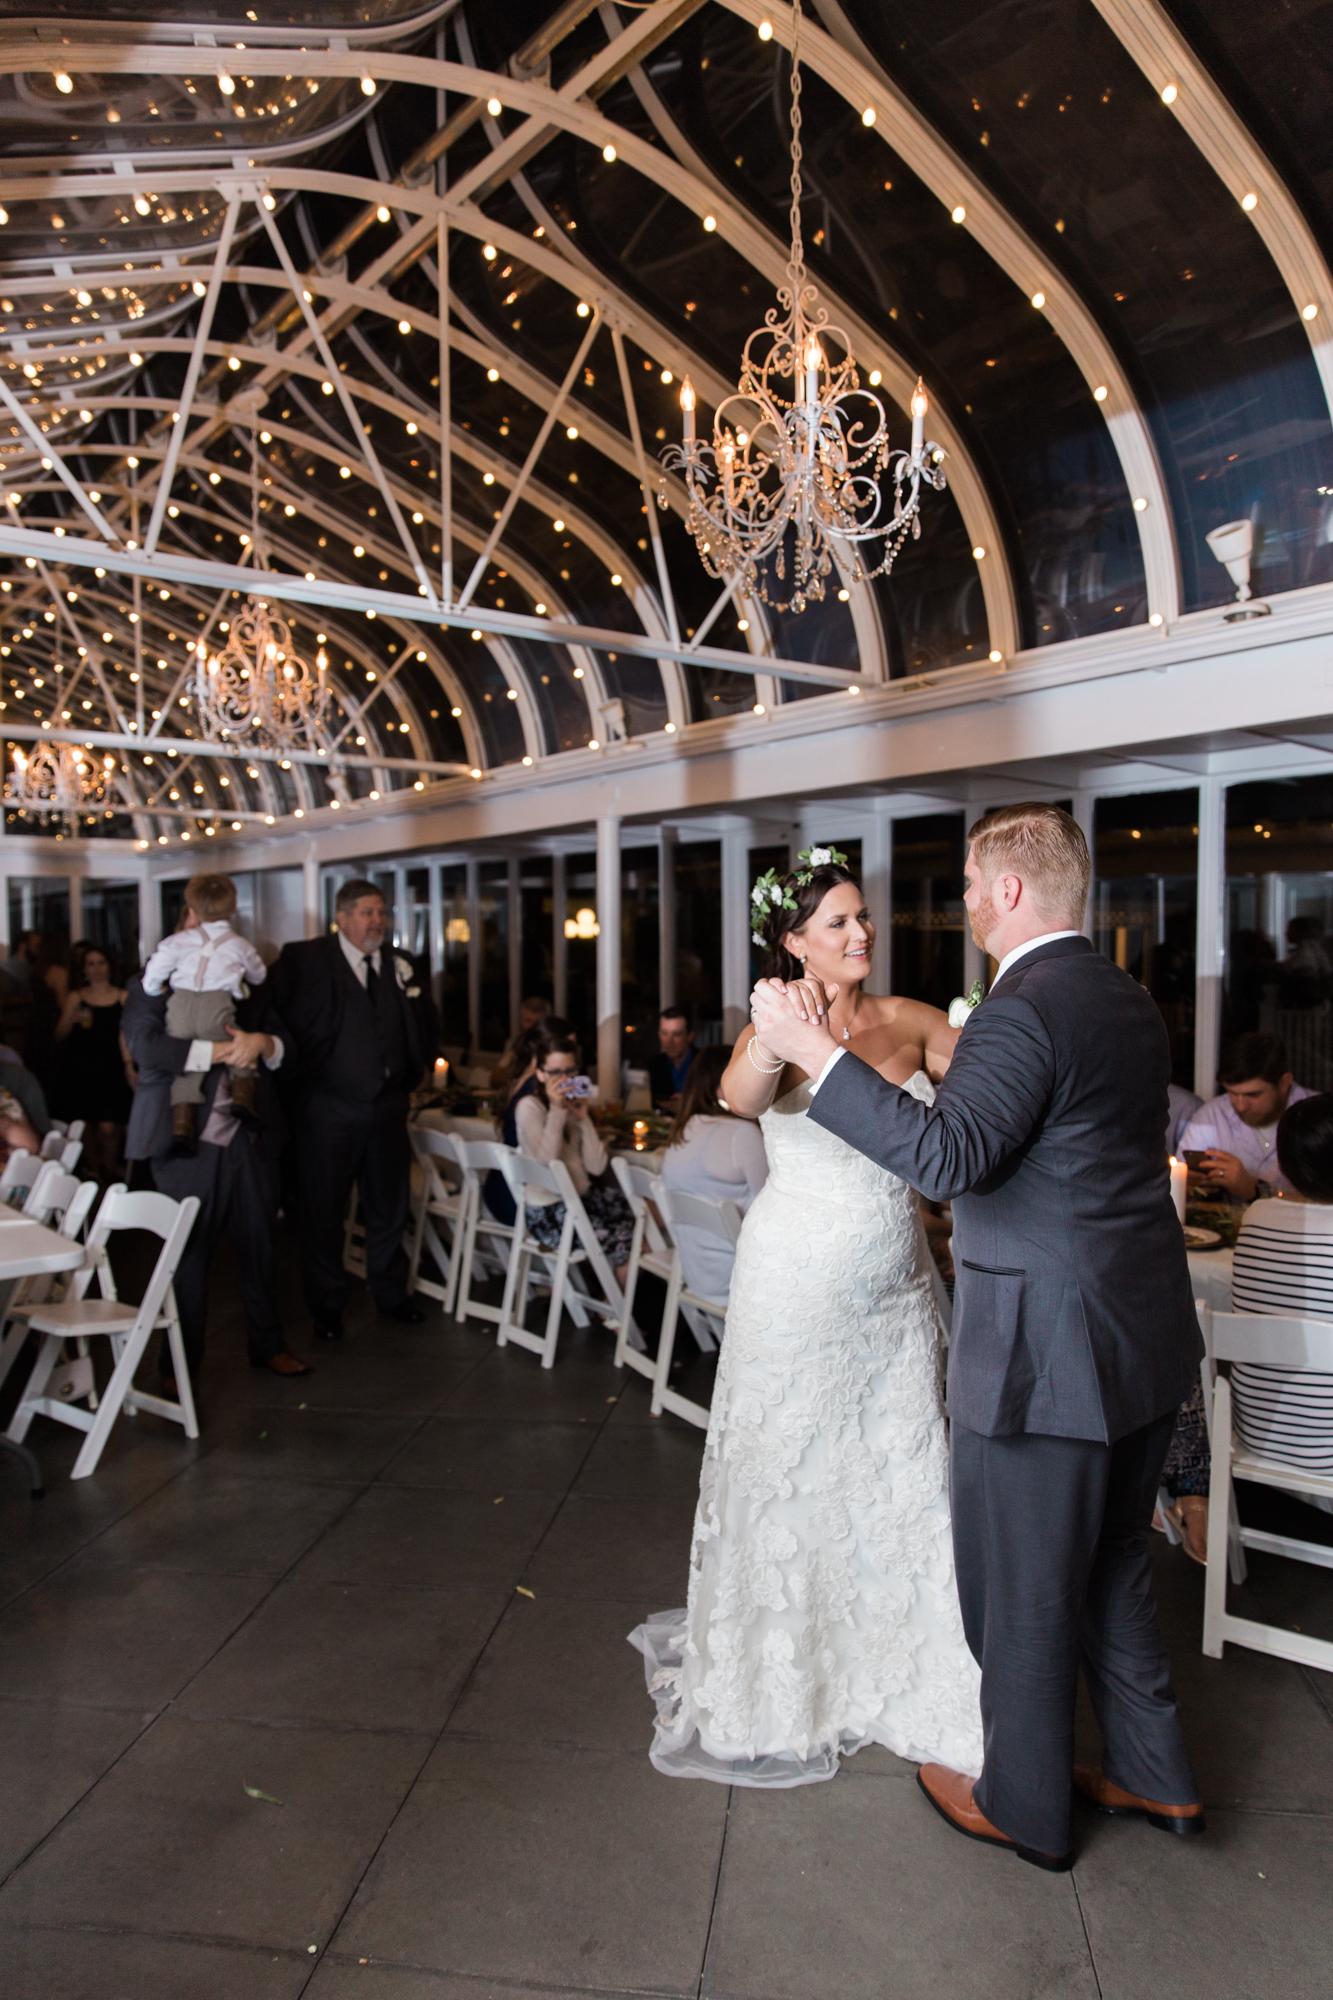 Houston, Texas Garden Wedding Photography | www.abbihearne.com